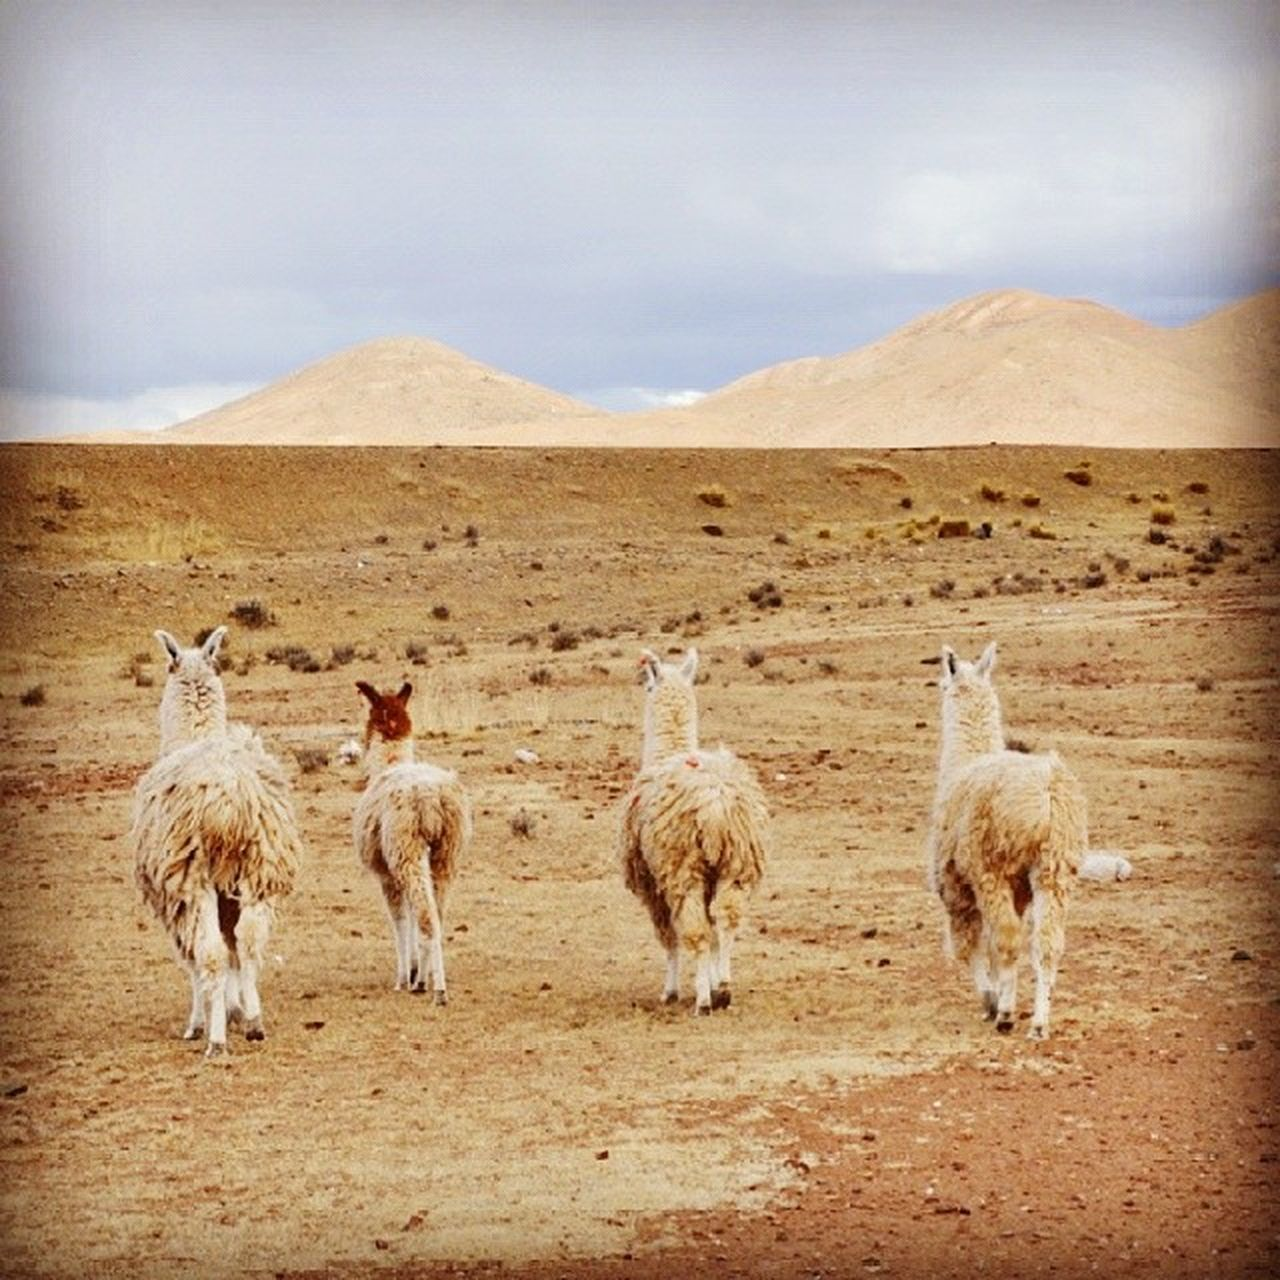 Rear View Of Llamas On Desert Landscape